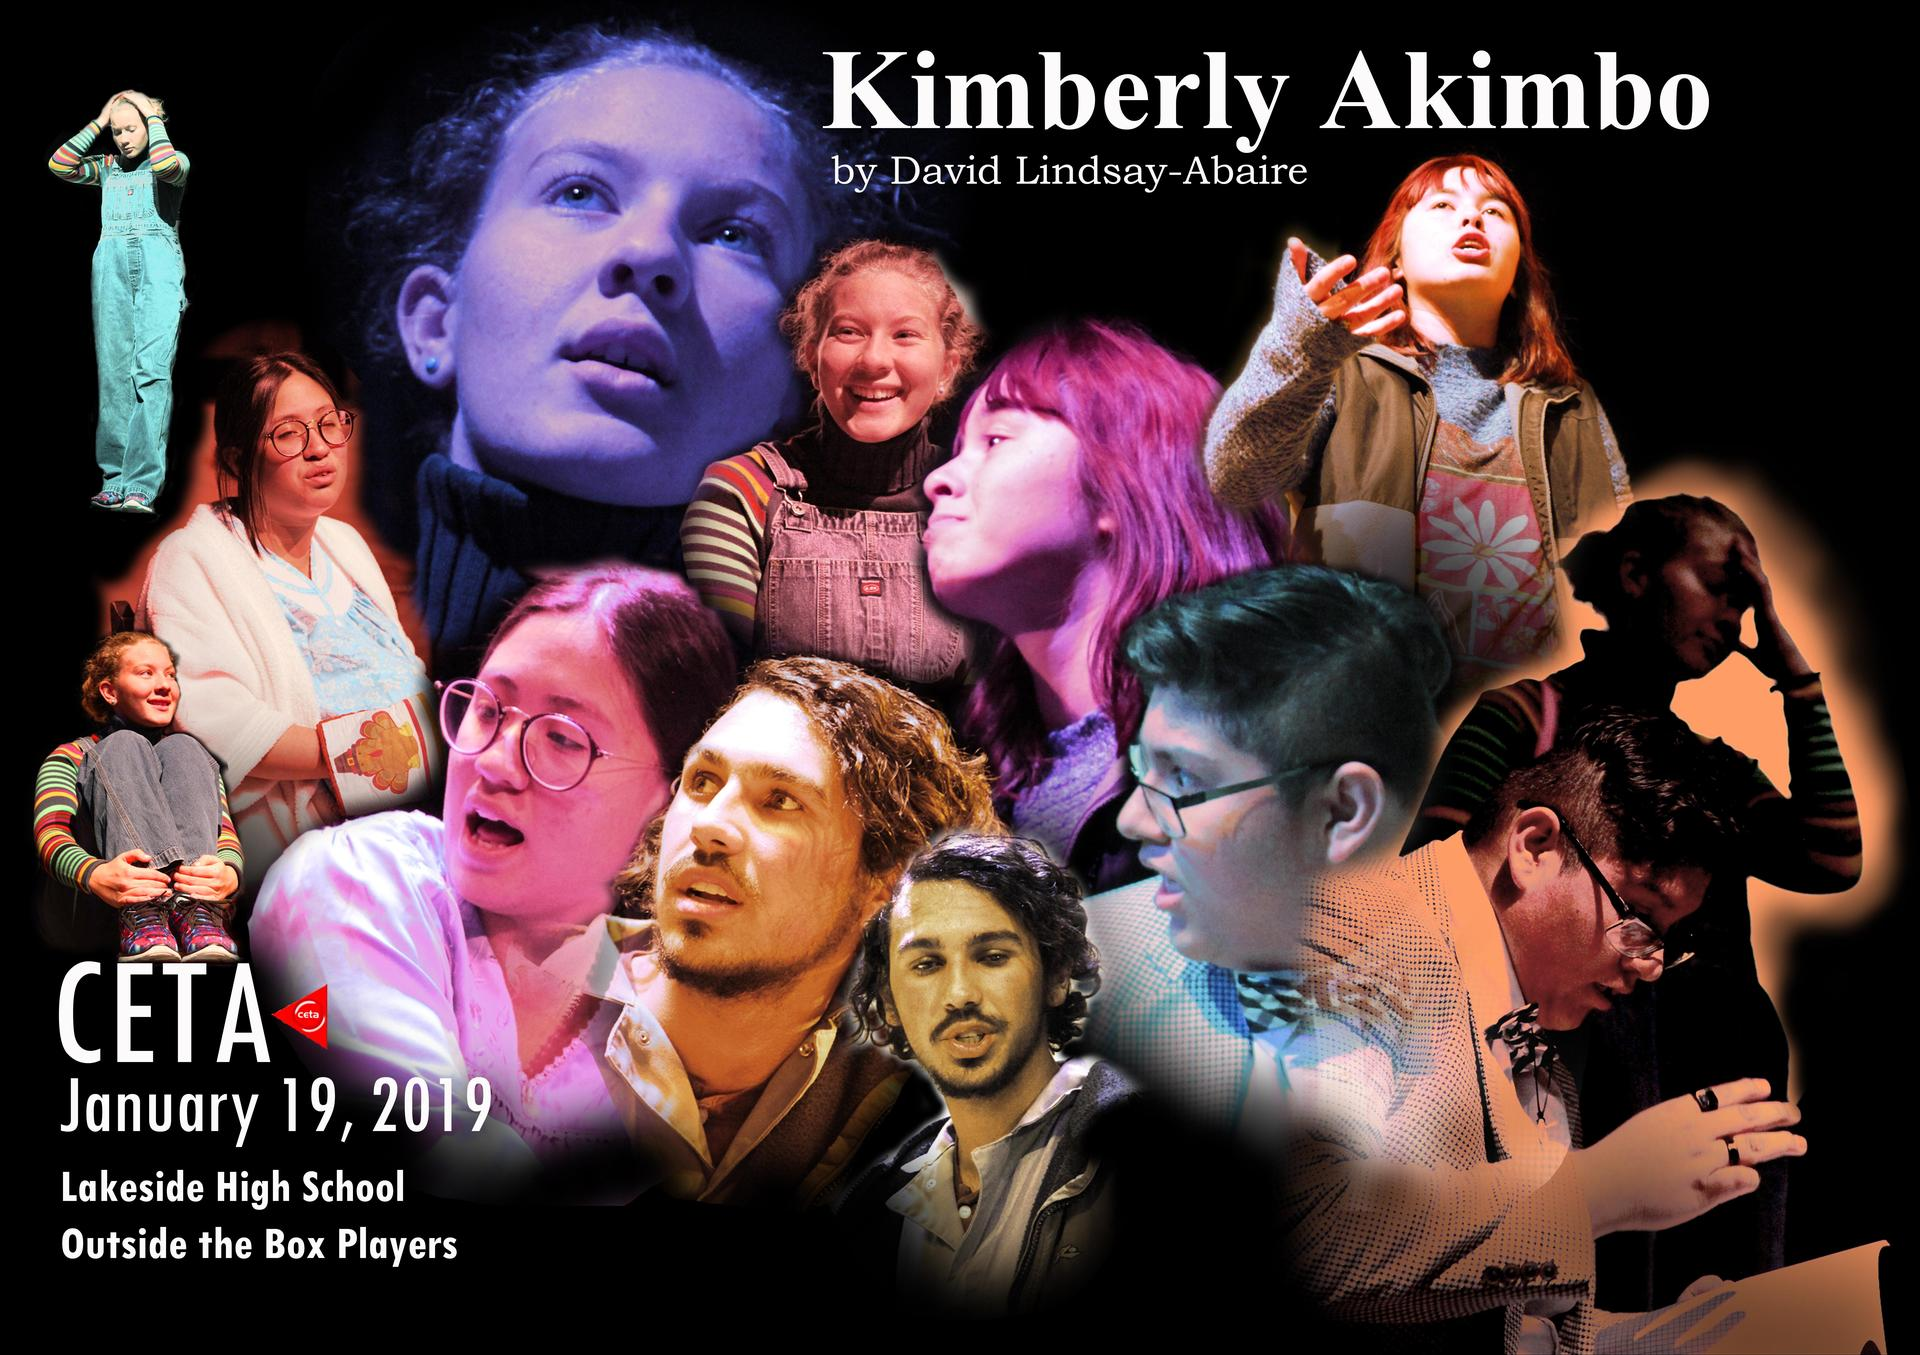 CAST PHOTO - Kimberly Akimbo